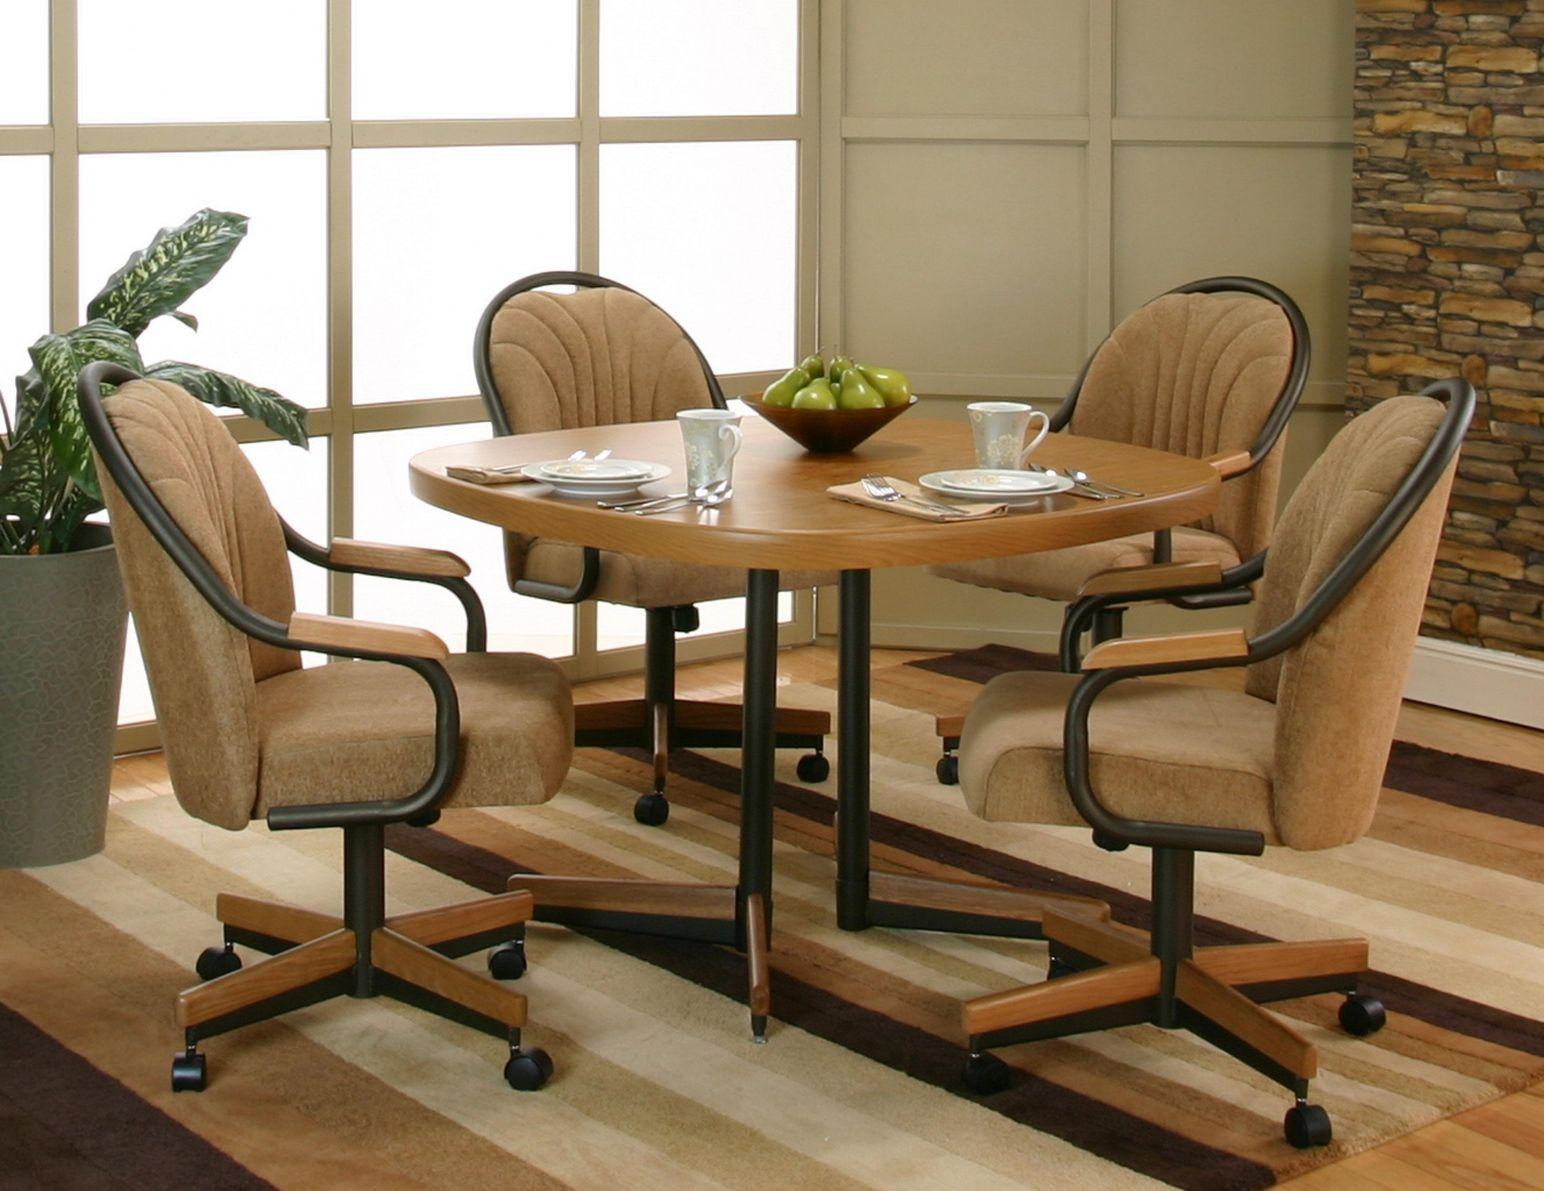 100 Kitchen Chairs On Casters Diy Kitchen Countertop Ideas Check More At Http Cacophonouscreations C Ide Dekorasi Rumah Furniture Dekorasi Rumah